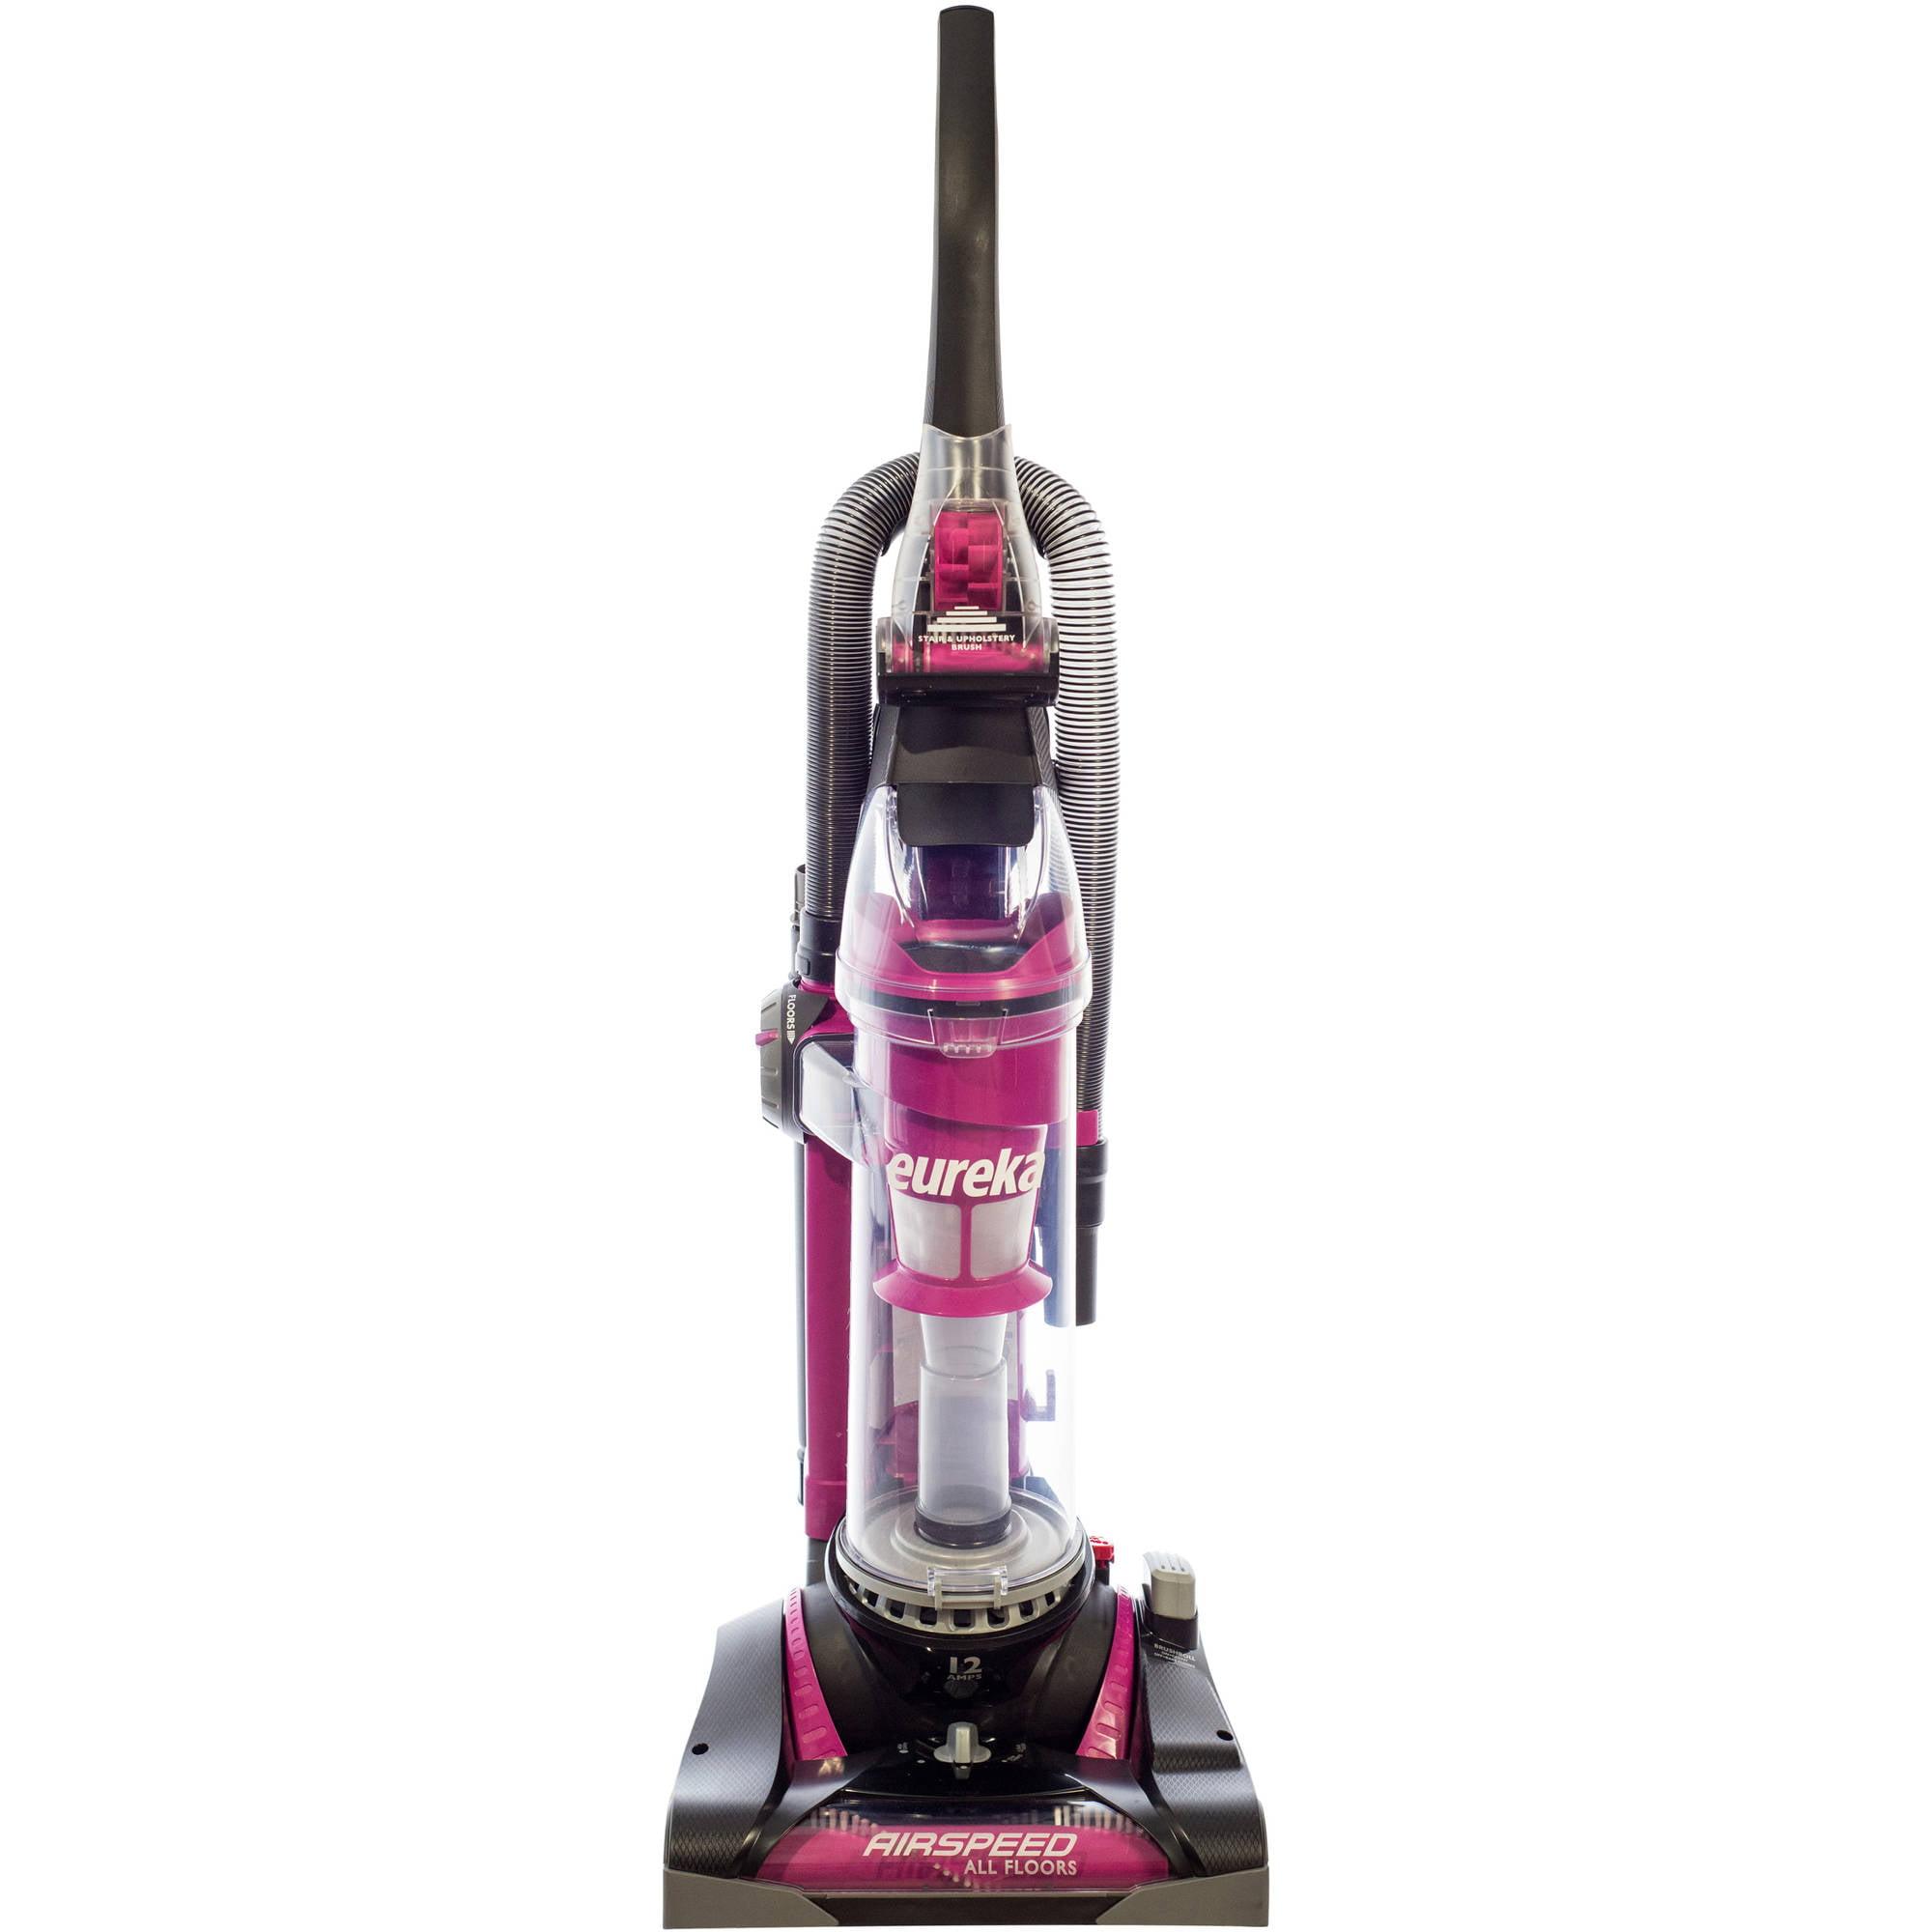 Eureka AirSpeed All Floors Upright Vacuum, AS3012A   Walmart.com